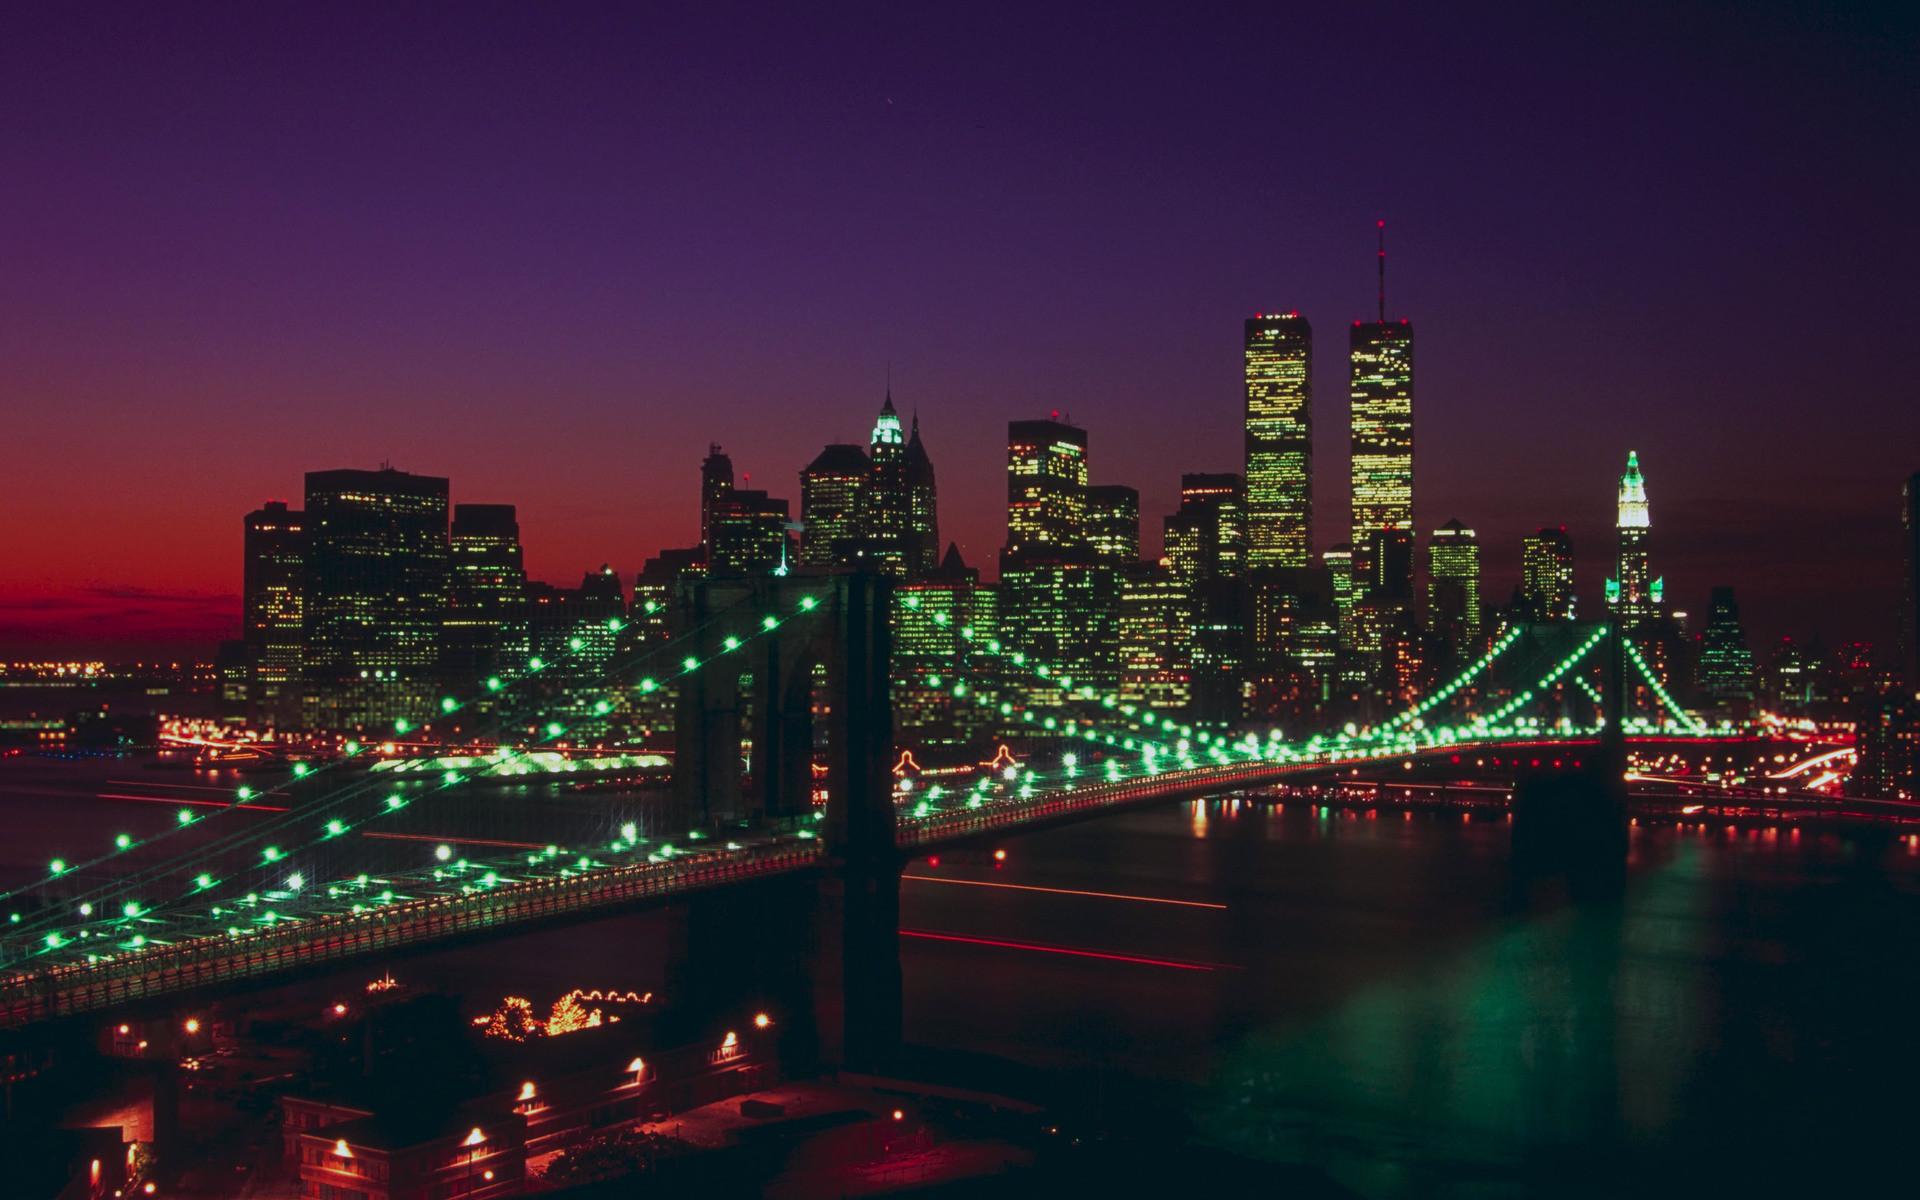 New York Skyline At Night Wallpaper Hd 3 City Hd Background Hd ..